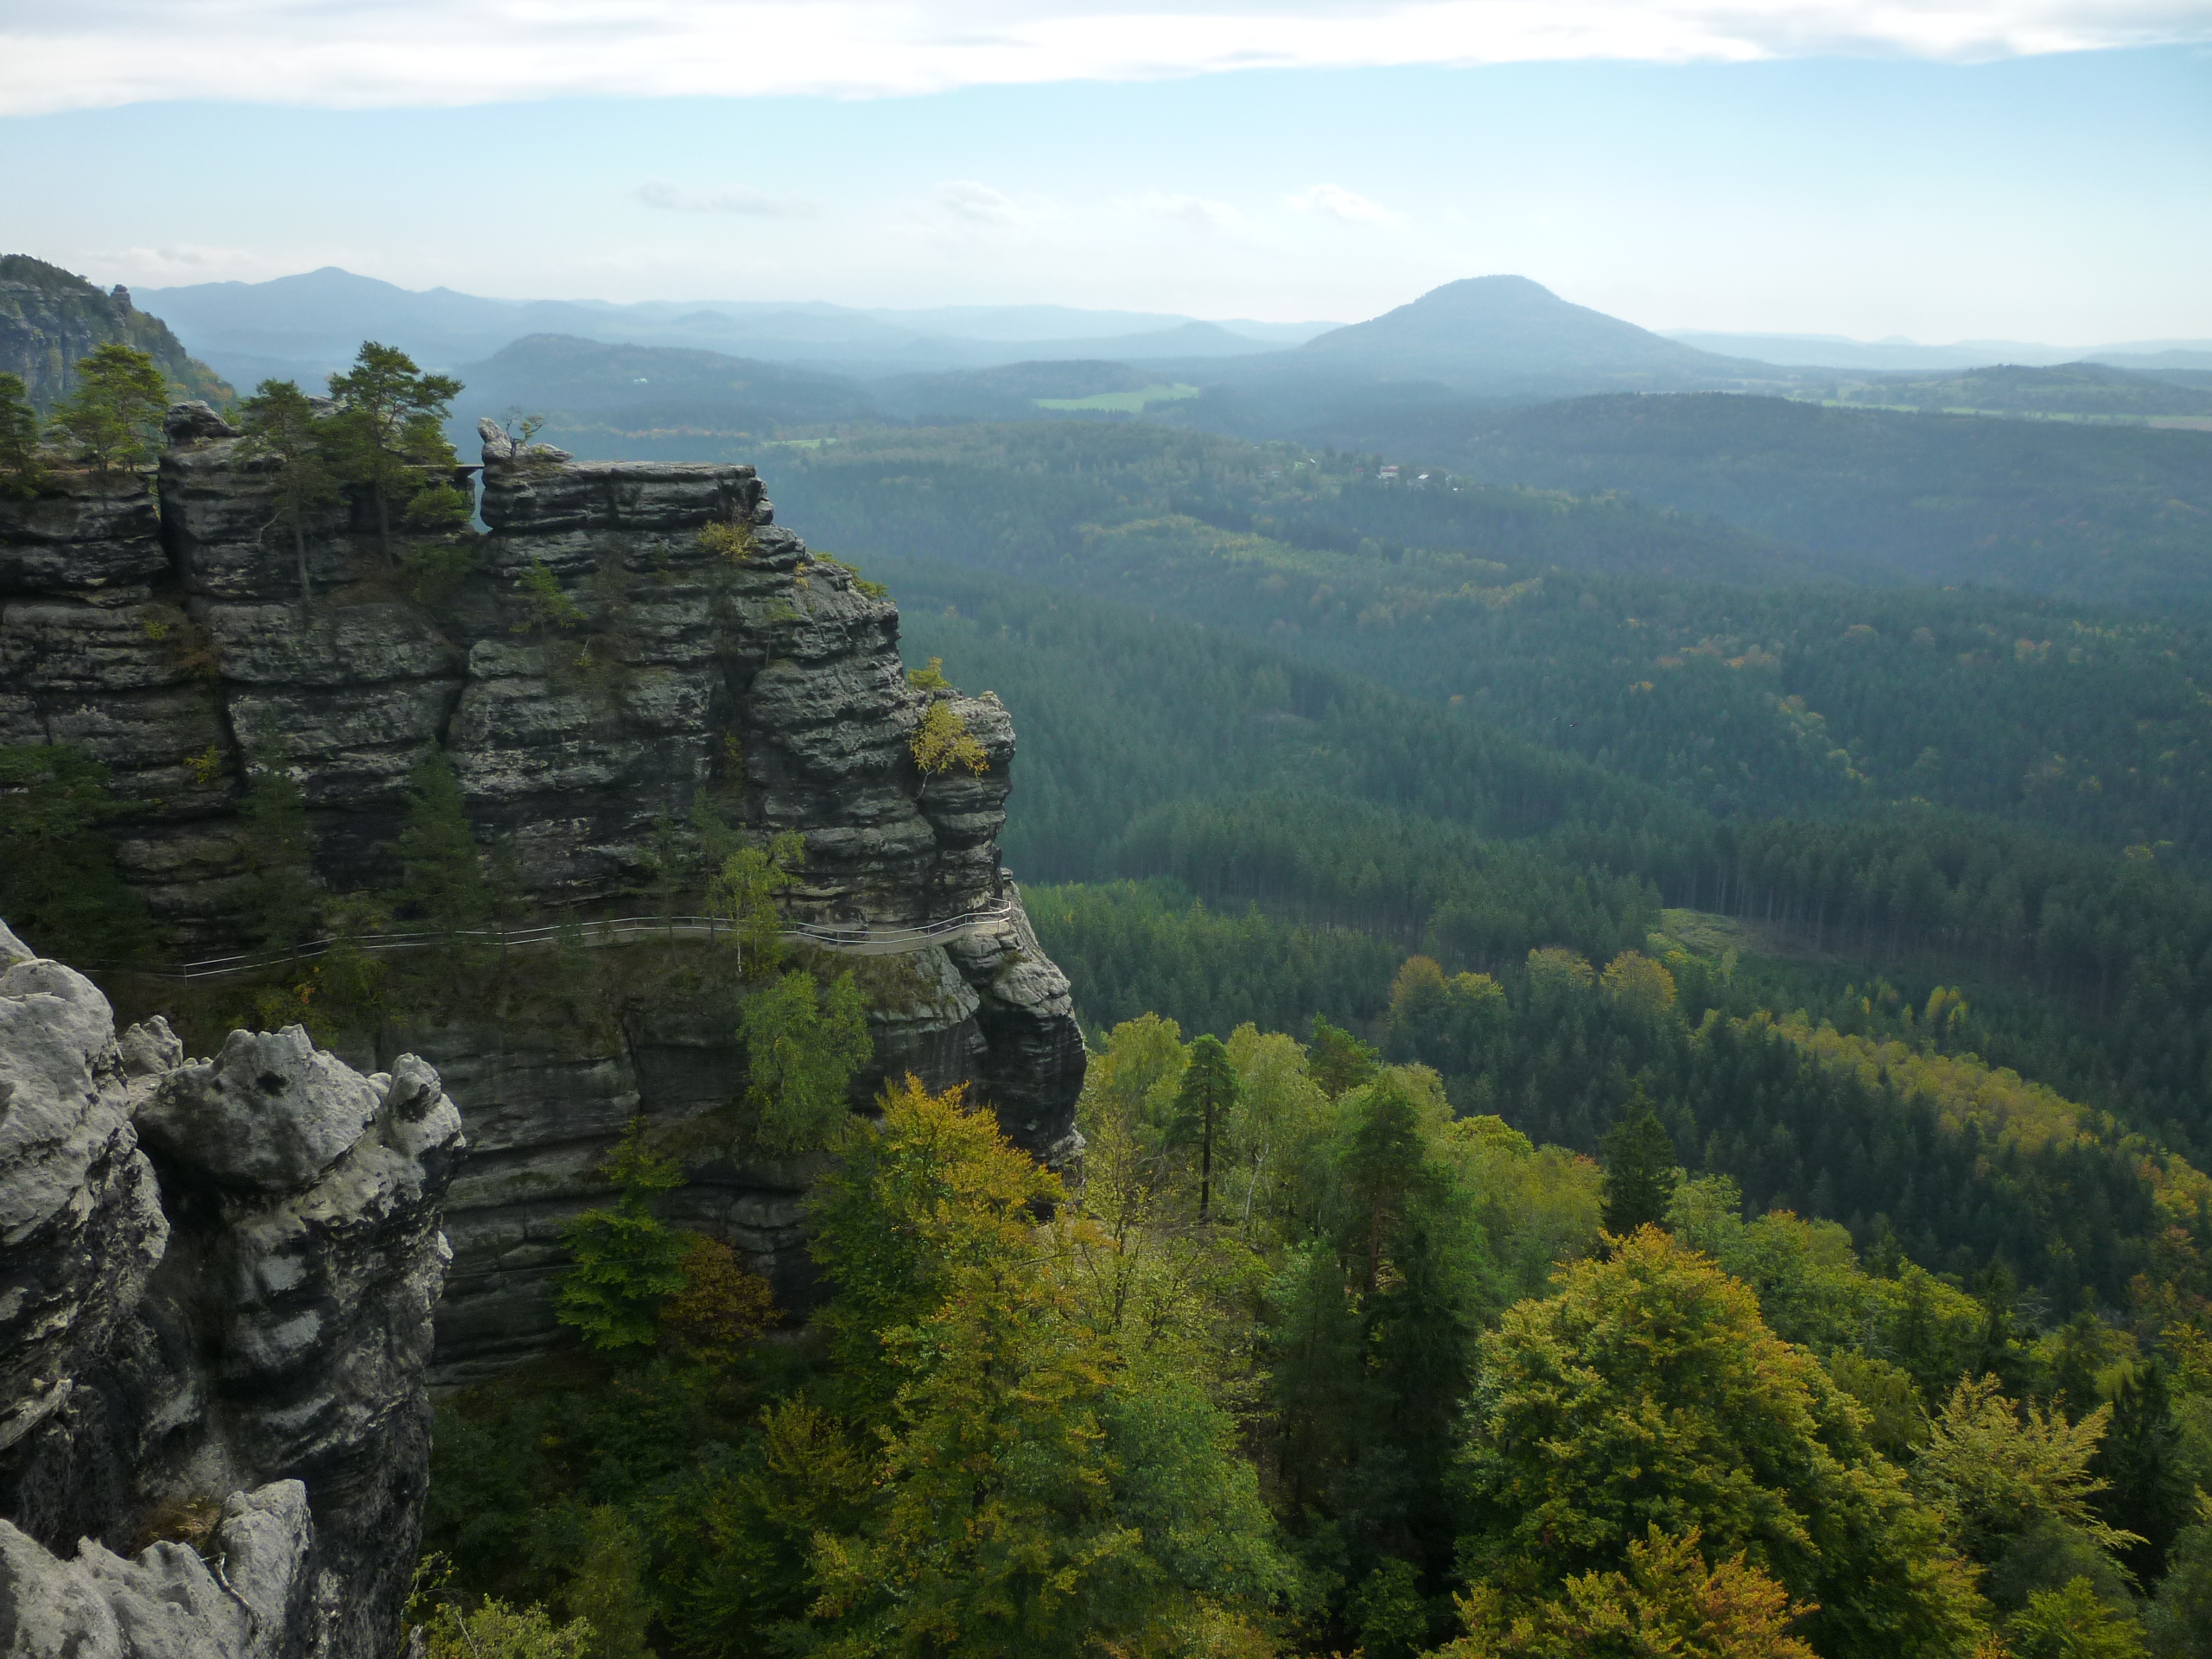 Hiking the Bohemian Paradise sandstone rock towns